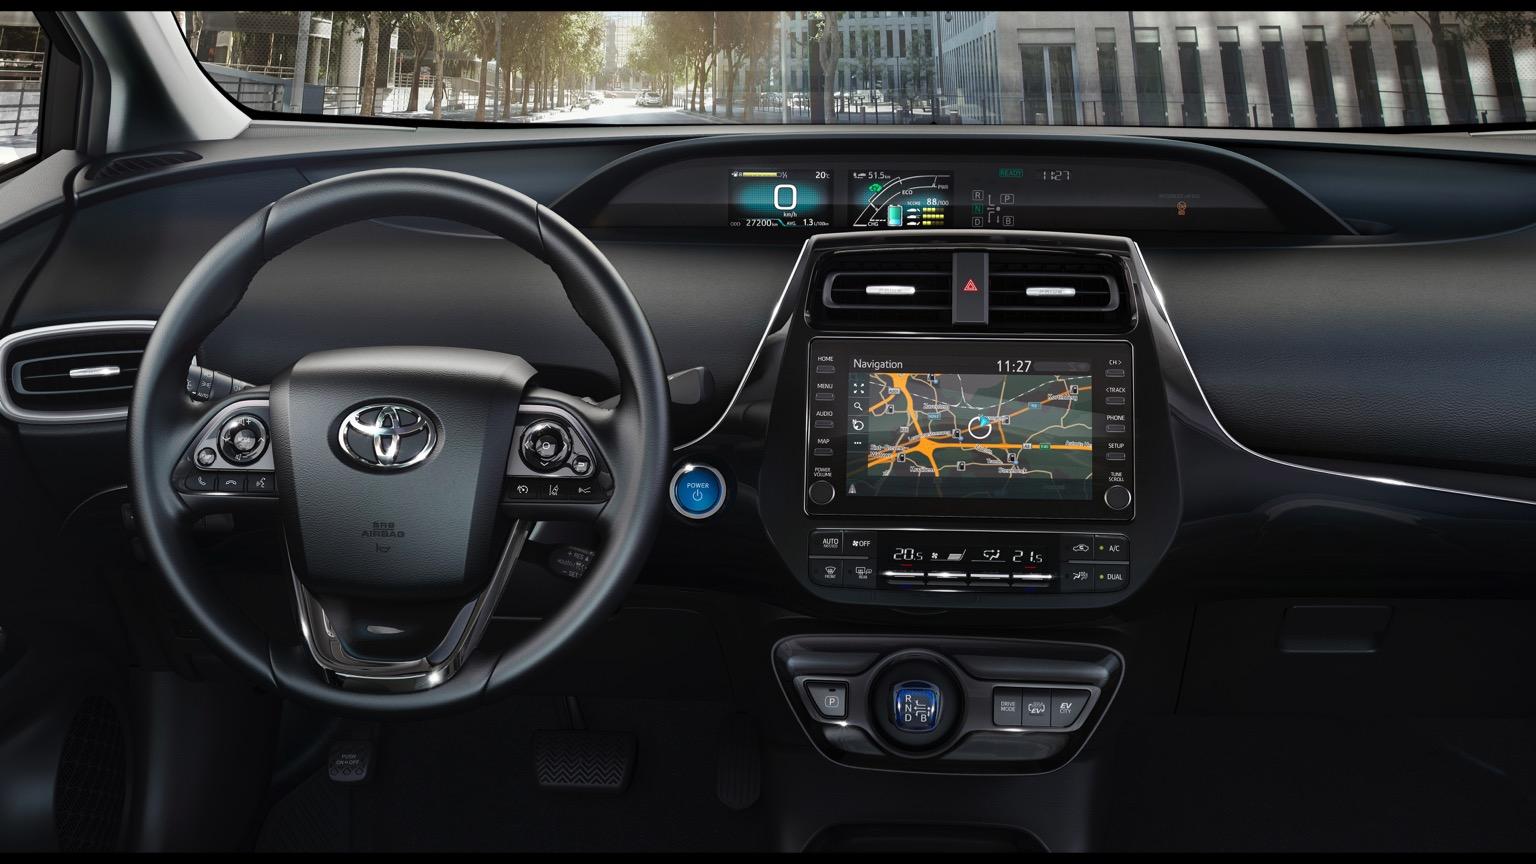 Toyota_Prius_Plug-in_Hybrid-2019-07@2x